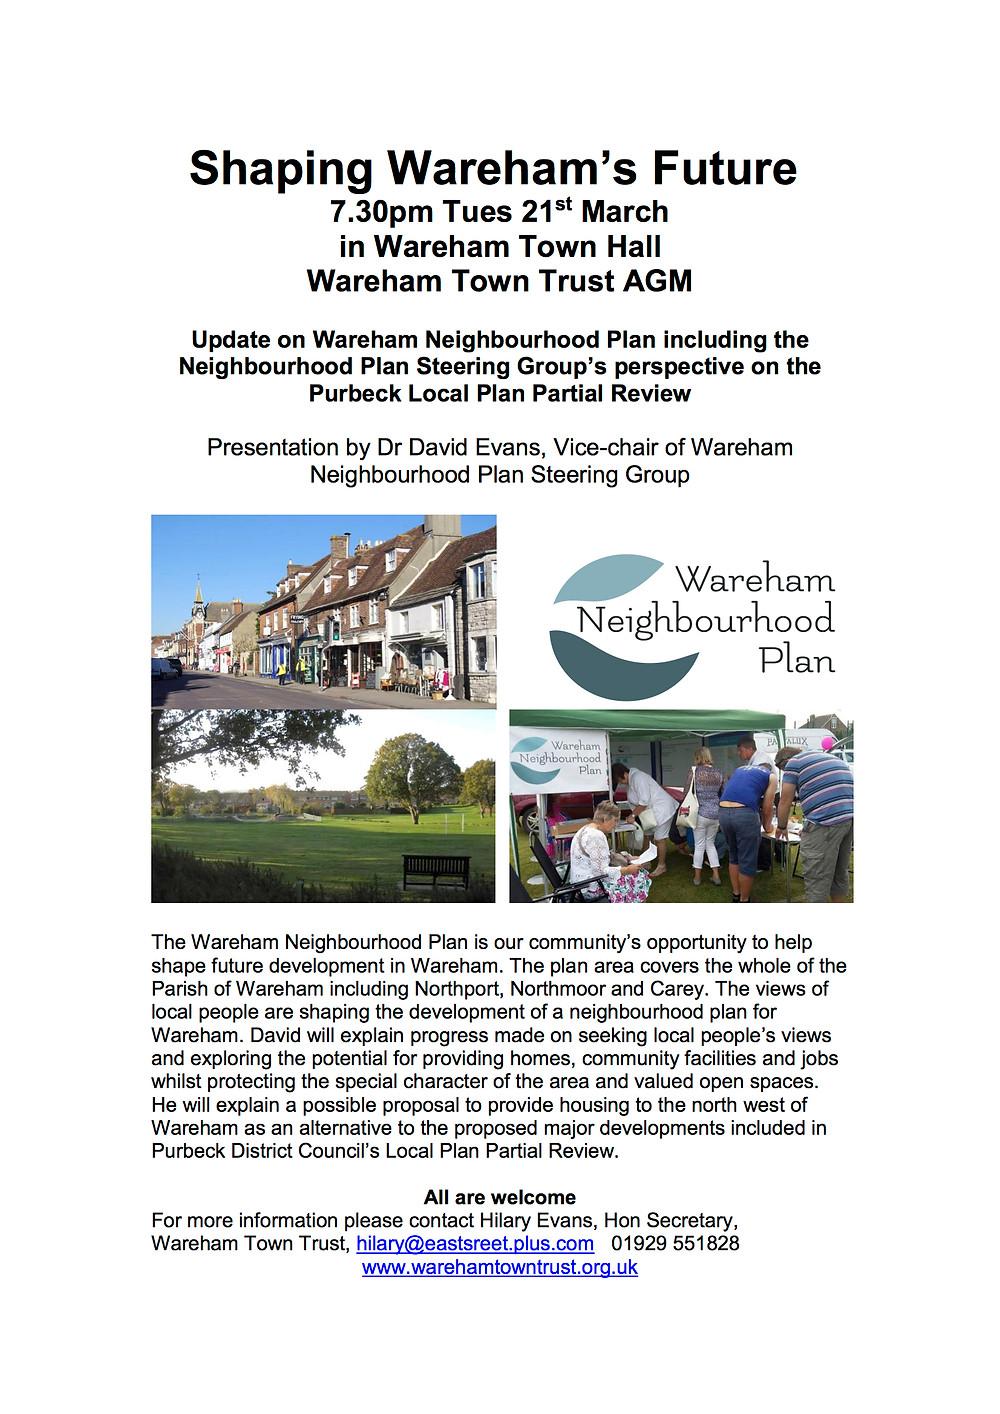 Shaping Wareham's Future - AGM 2017